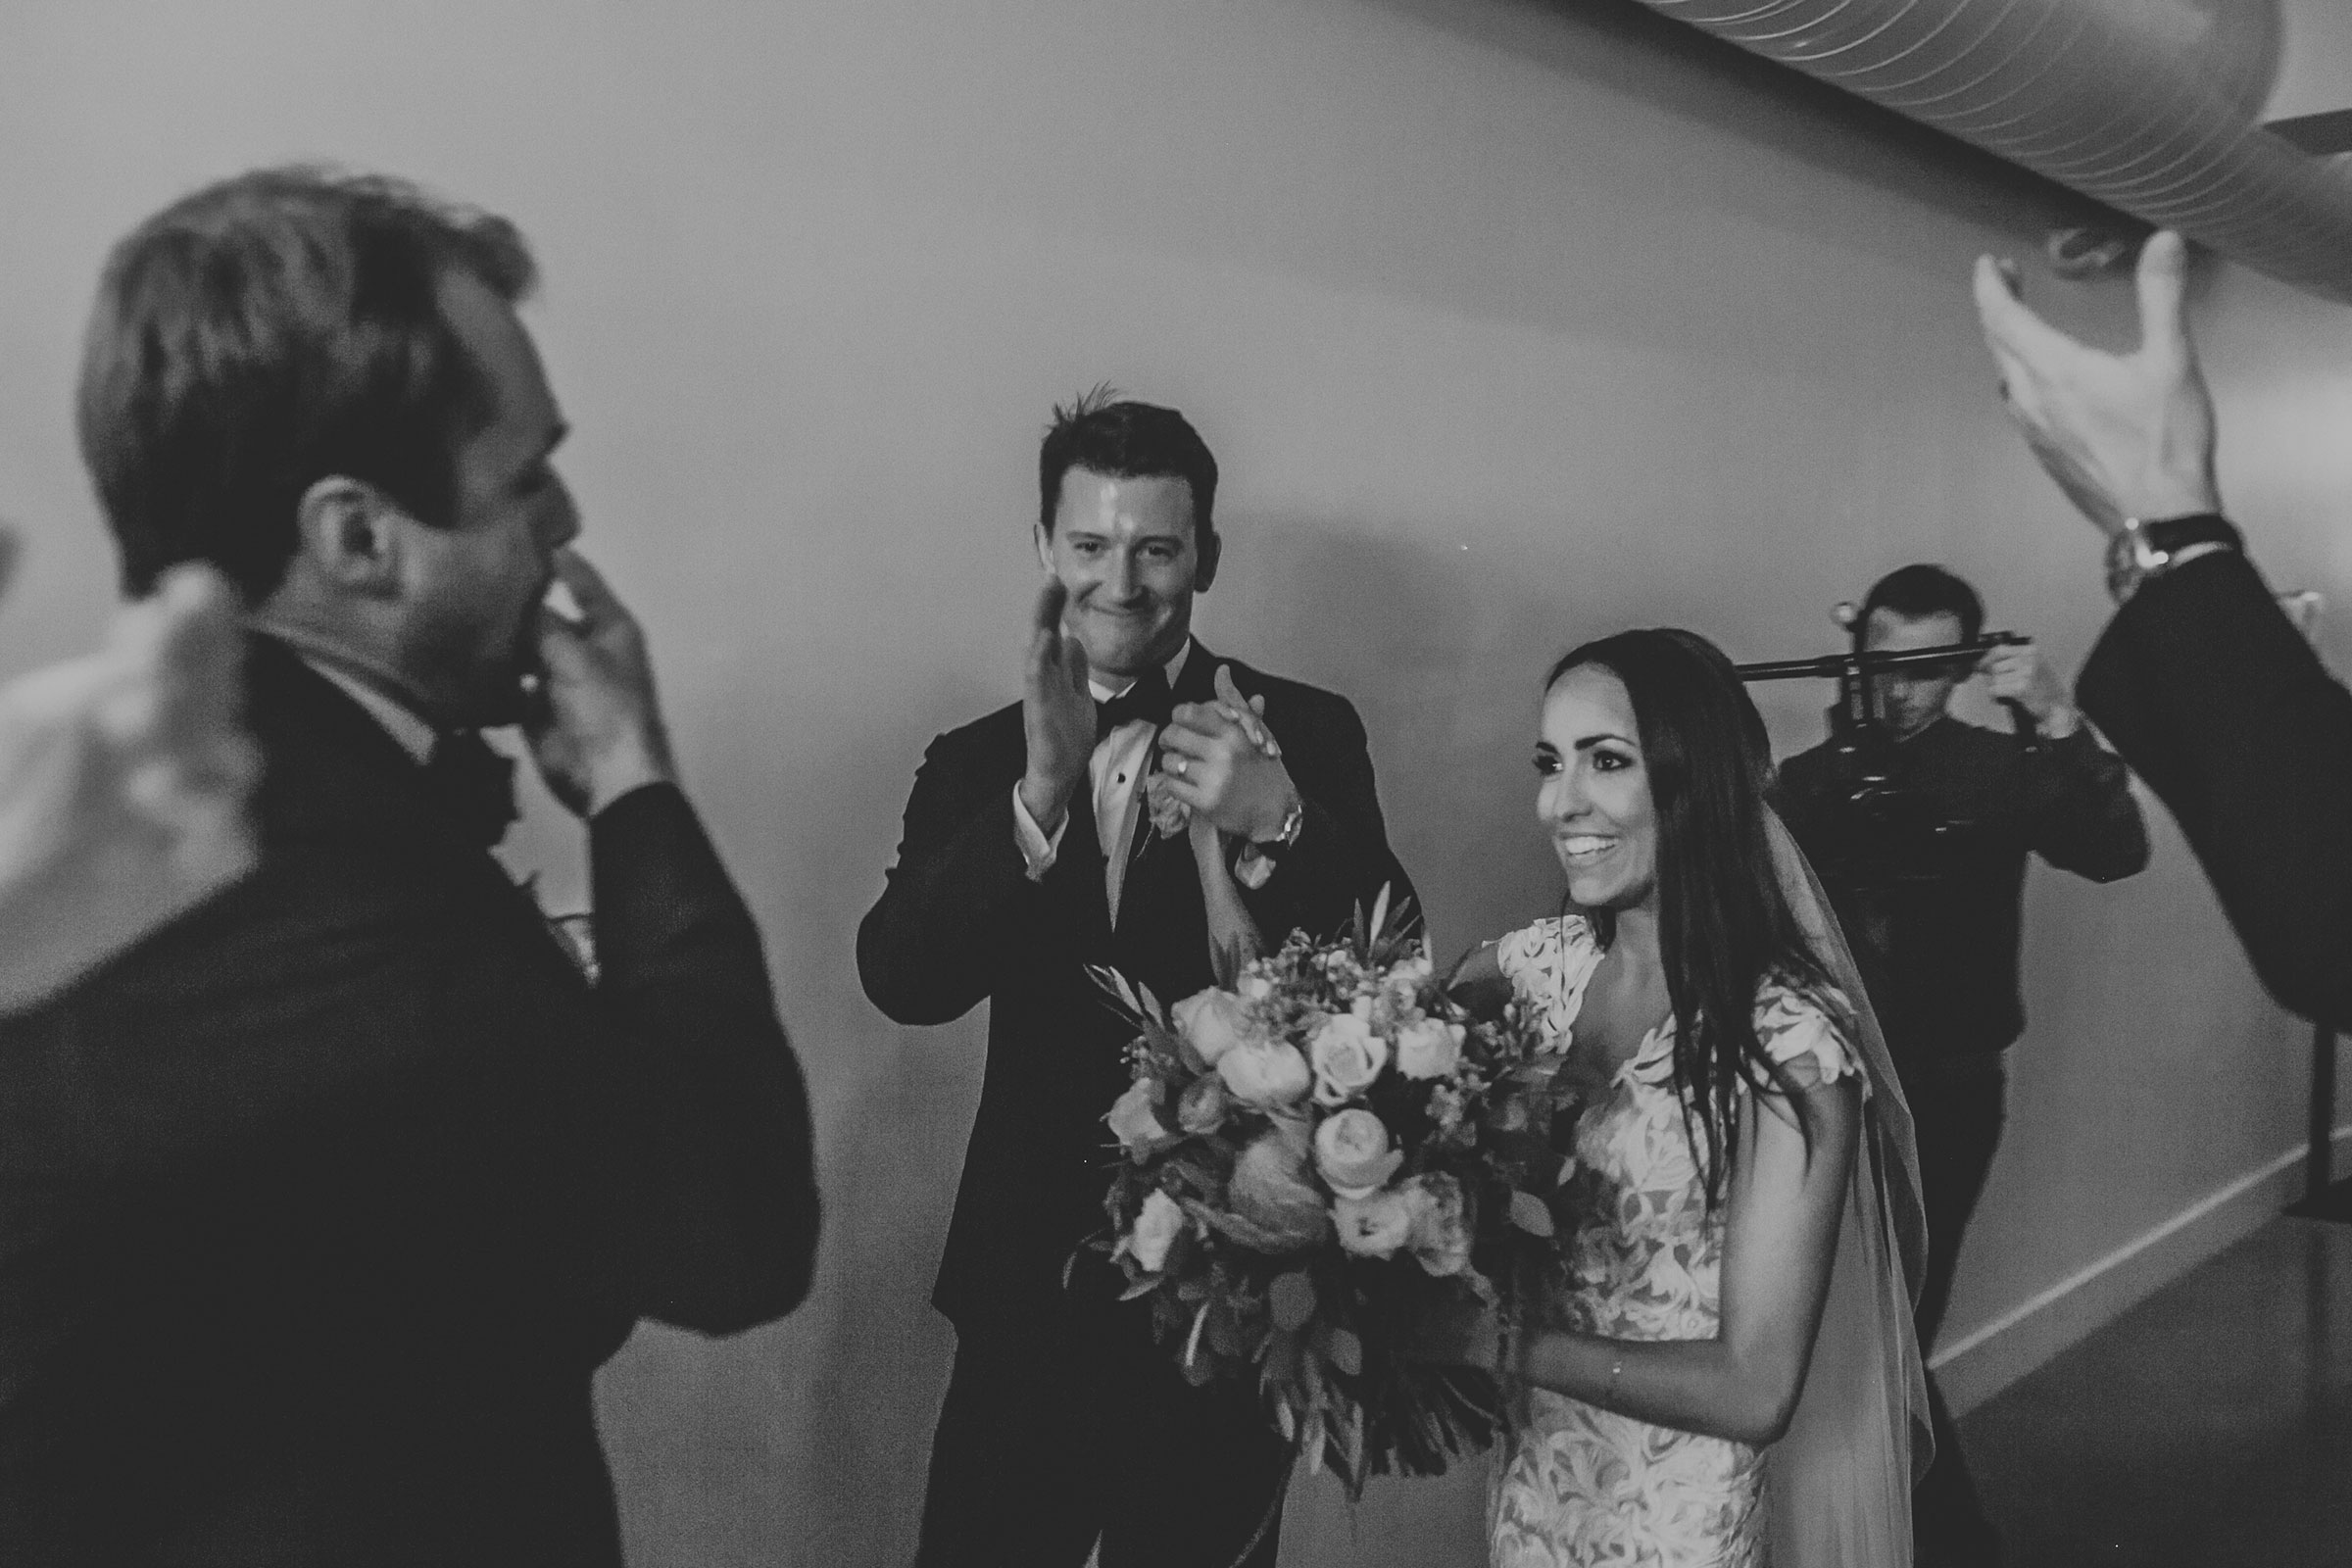 wedding-couple-grand-enterance-founders-one-nine-omaha-nebraska-raelyn-ramey-photography.jpg